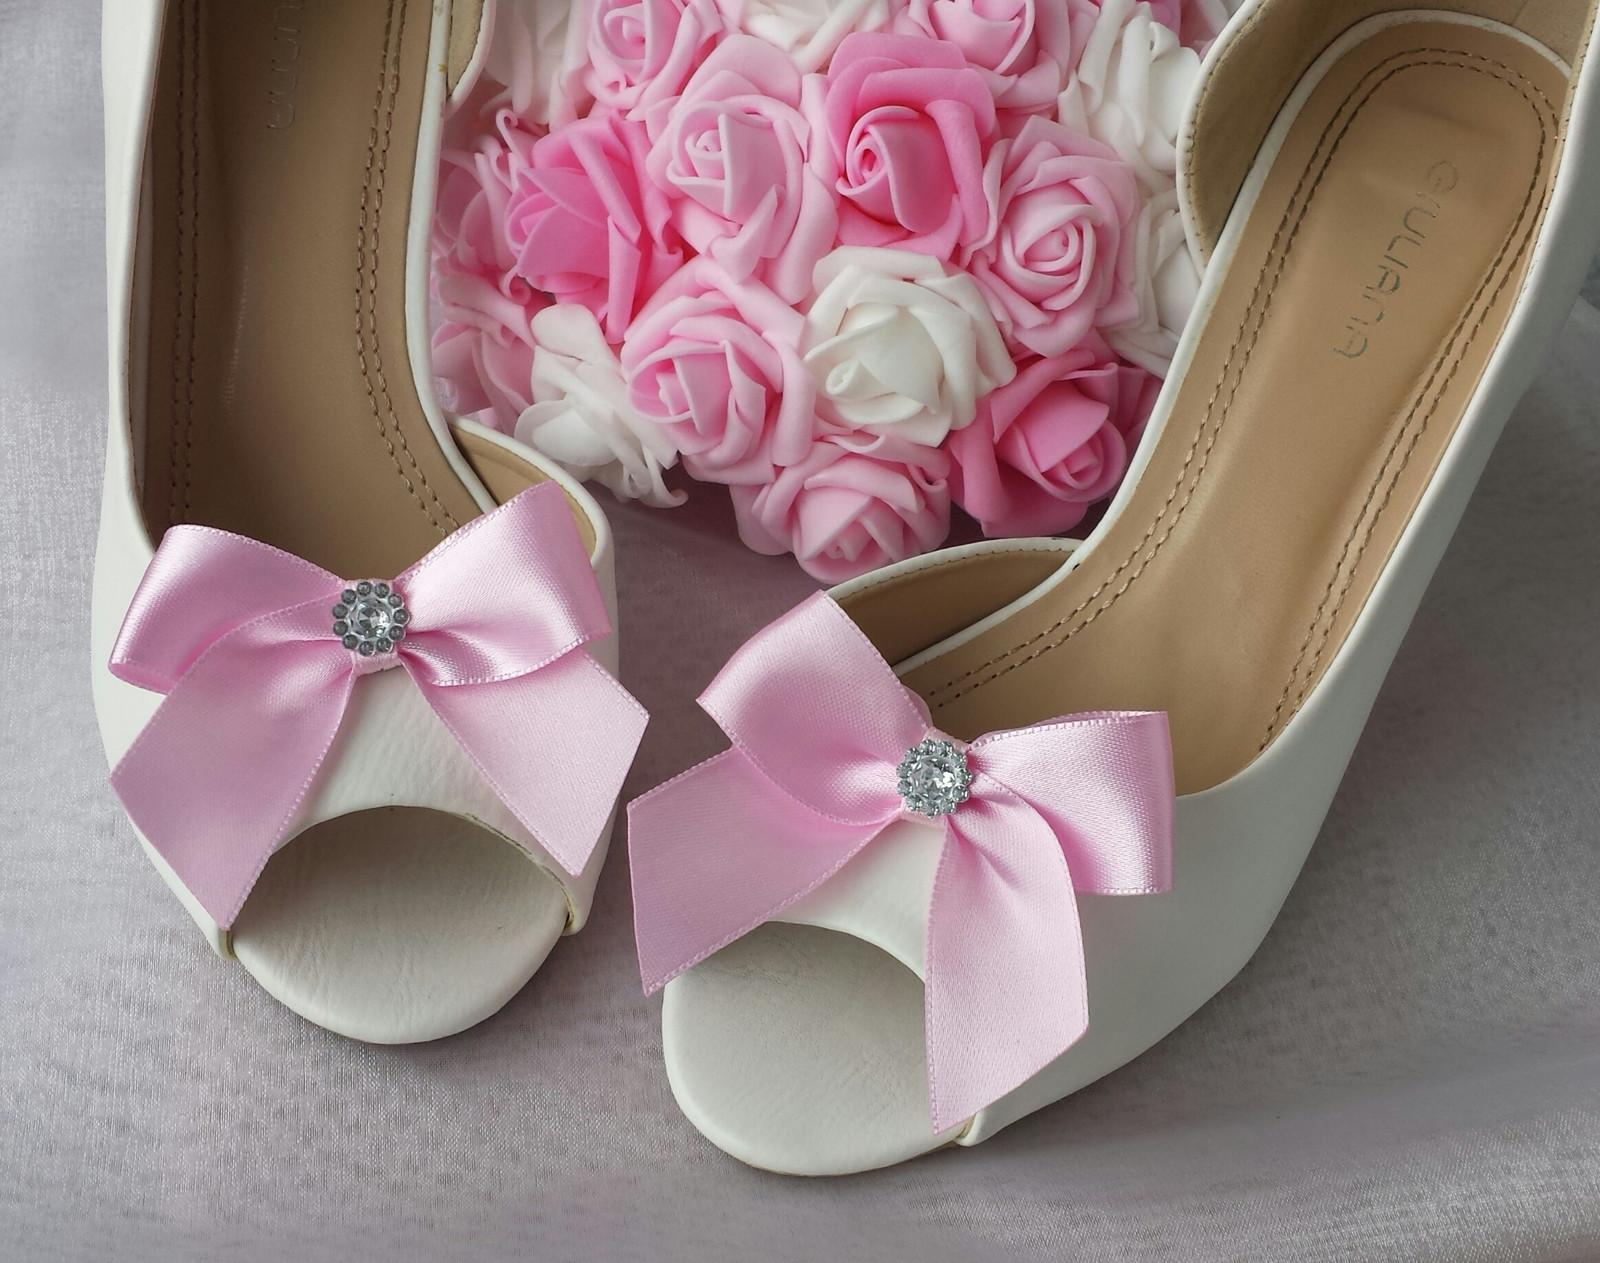 Klipy na boty s růžovou mašličkou a brožičkou - Obrázek č. 1